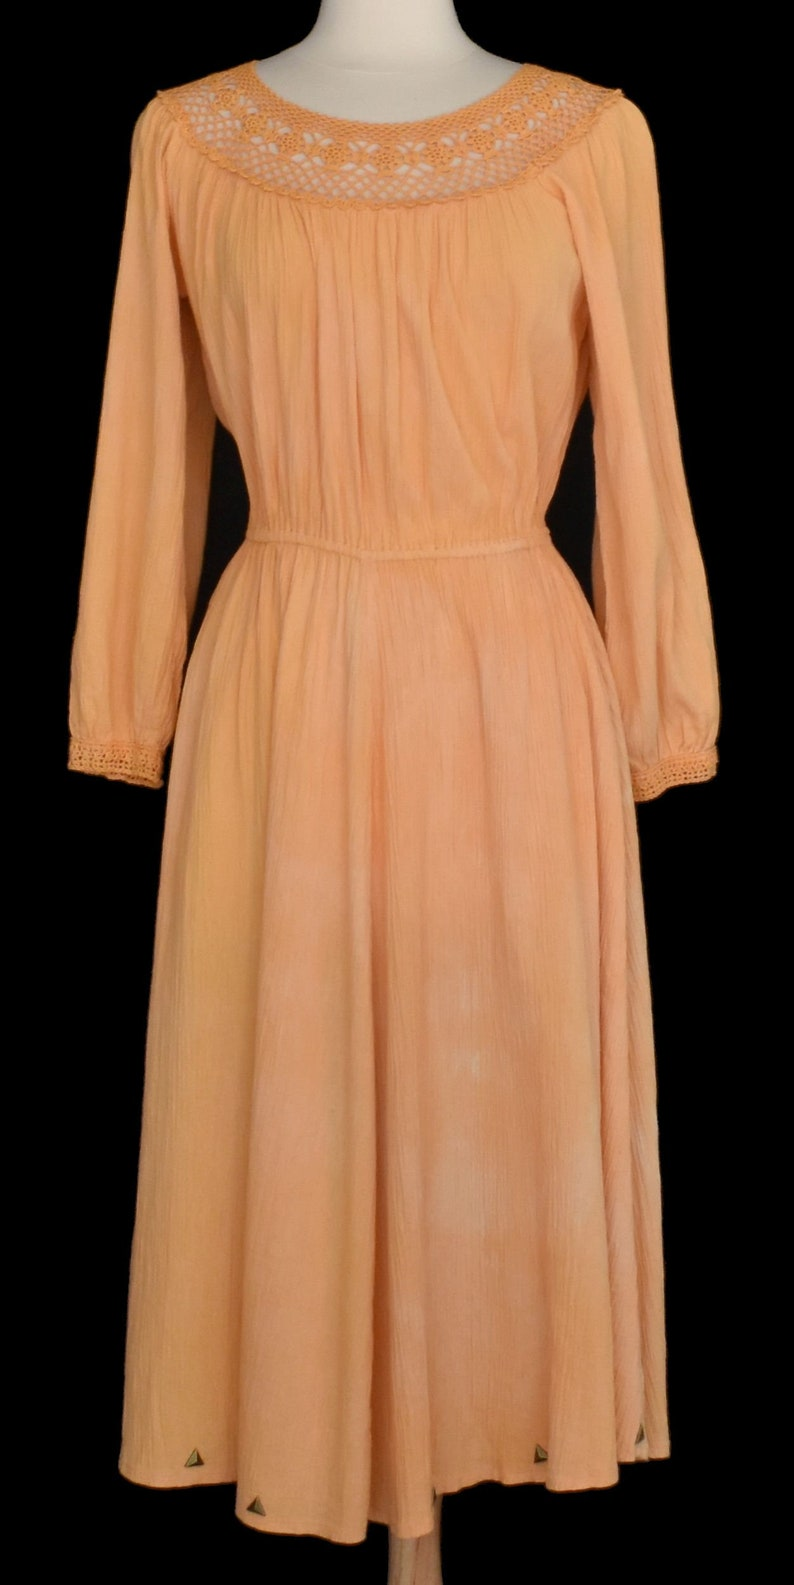 Designer Balkan 70s Gauze Dress Handmade in Cyprus 3-D Studded Peach Ombre Crinkle Gauze Grecian Goddess Dress Bohemian Dress M to L